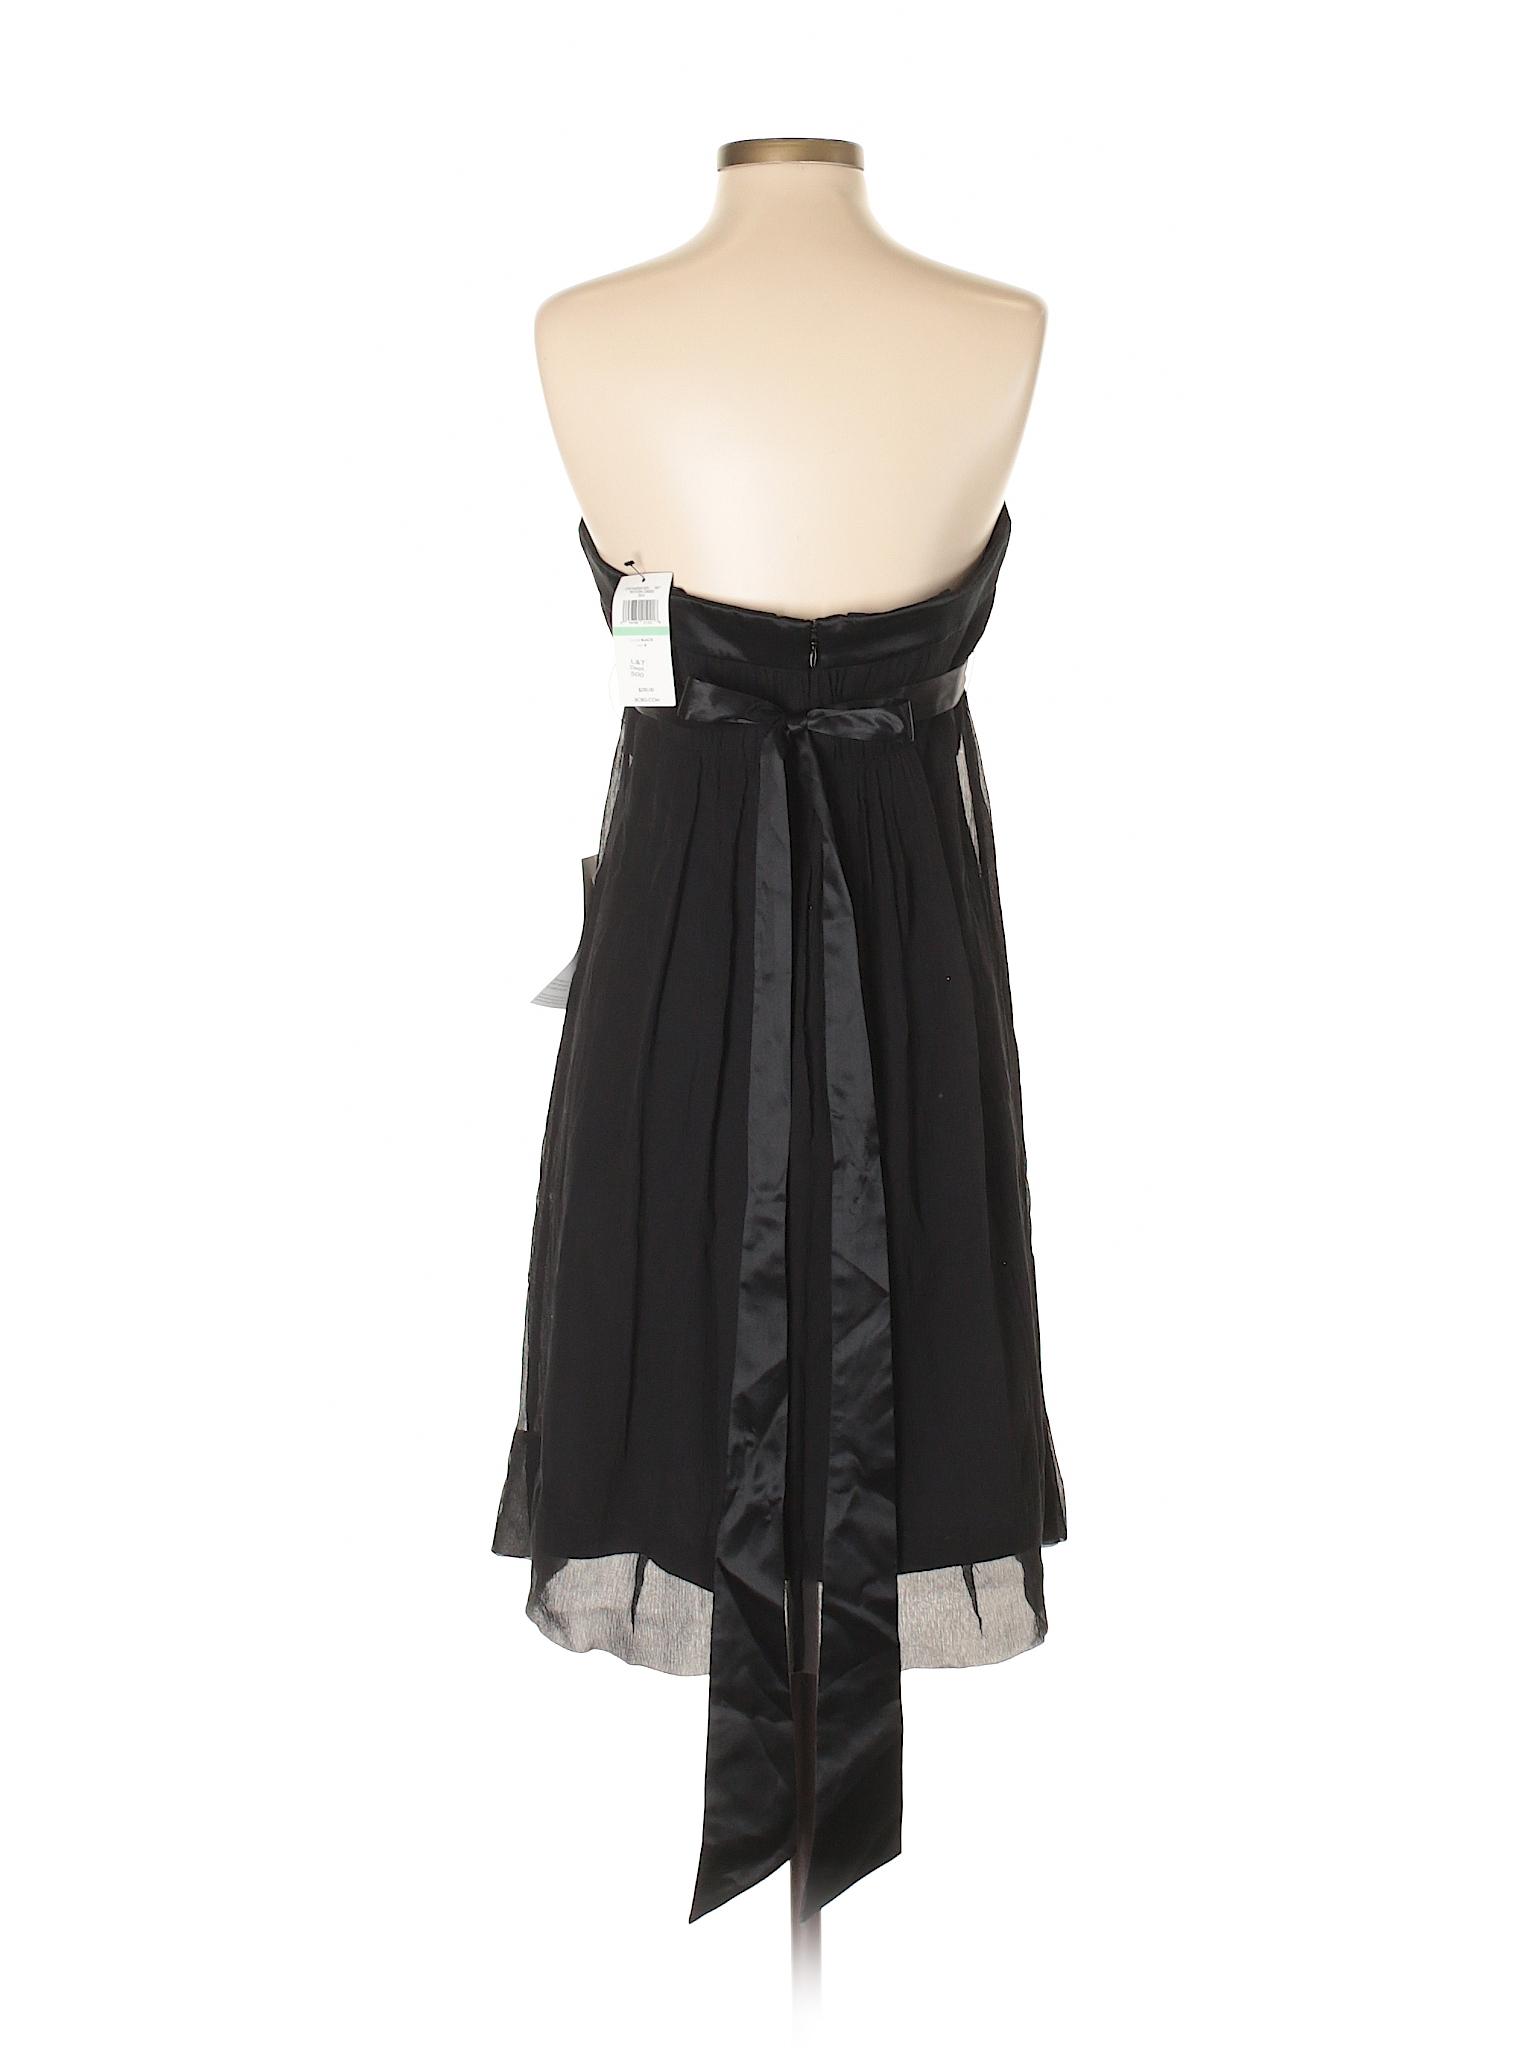 Dress Casual BCBGMAXAZRIA Dress Casual Selling Dress BCBGMAXAZRIA BCBGMAXAZRIA Casual Selling Selling BtnEqx8wtd